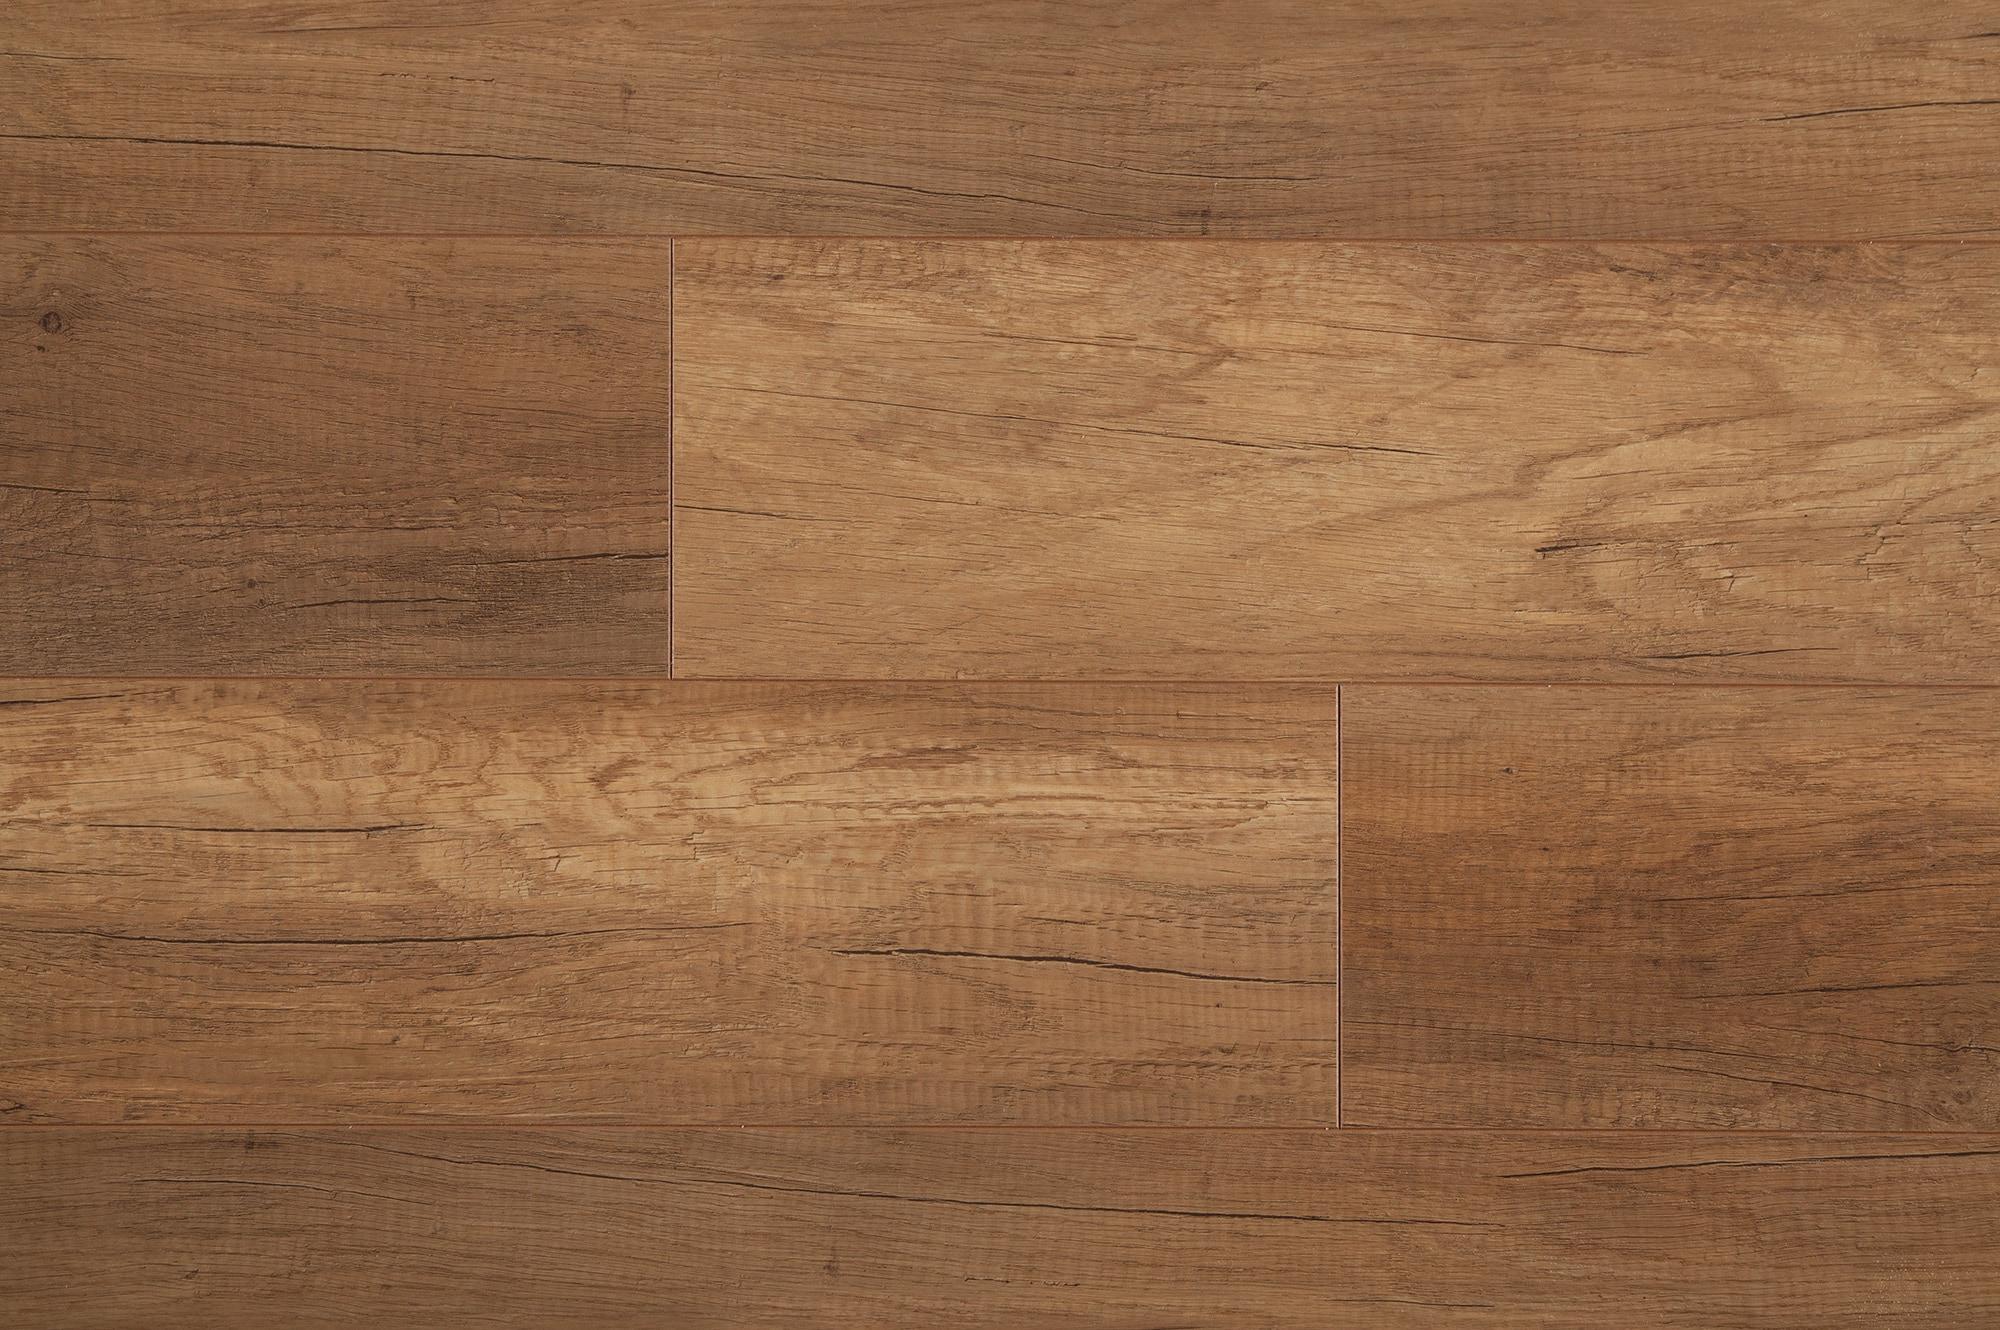 Lamton laminate 10mm european peaks collection elbrus oak for European laminate flooring